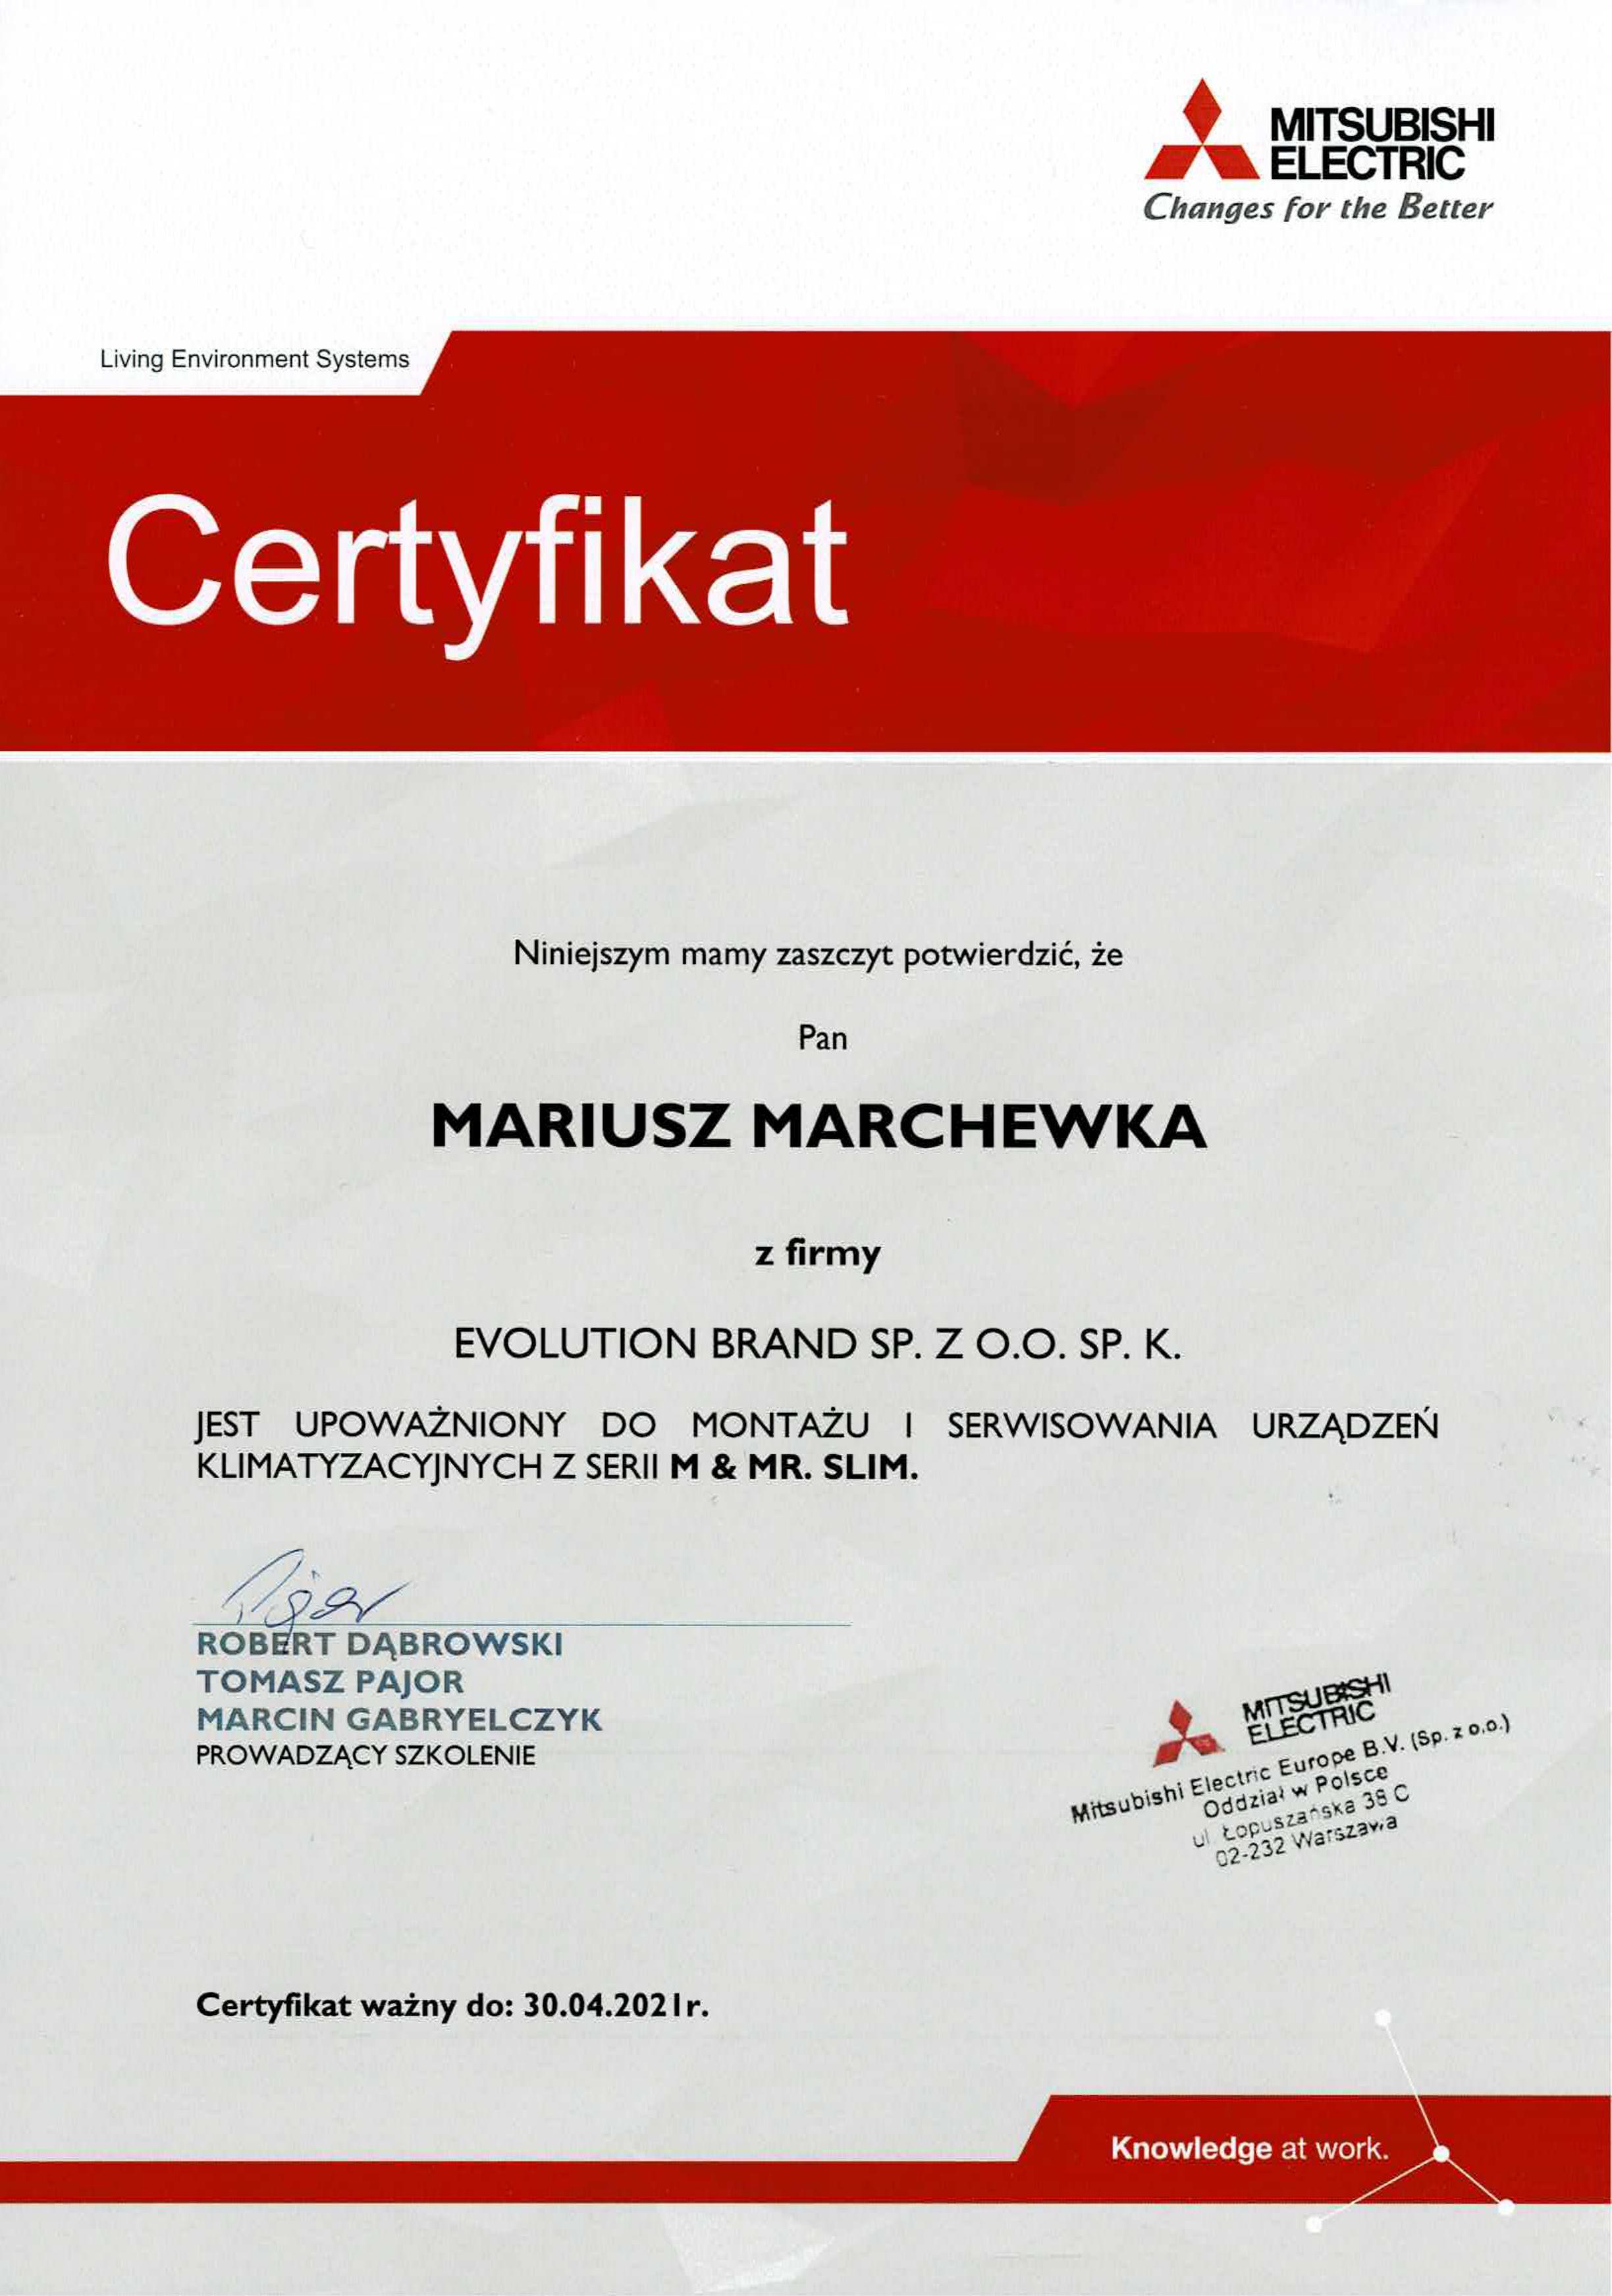 Certyfikat Mitsubishi Electric 2020